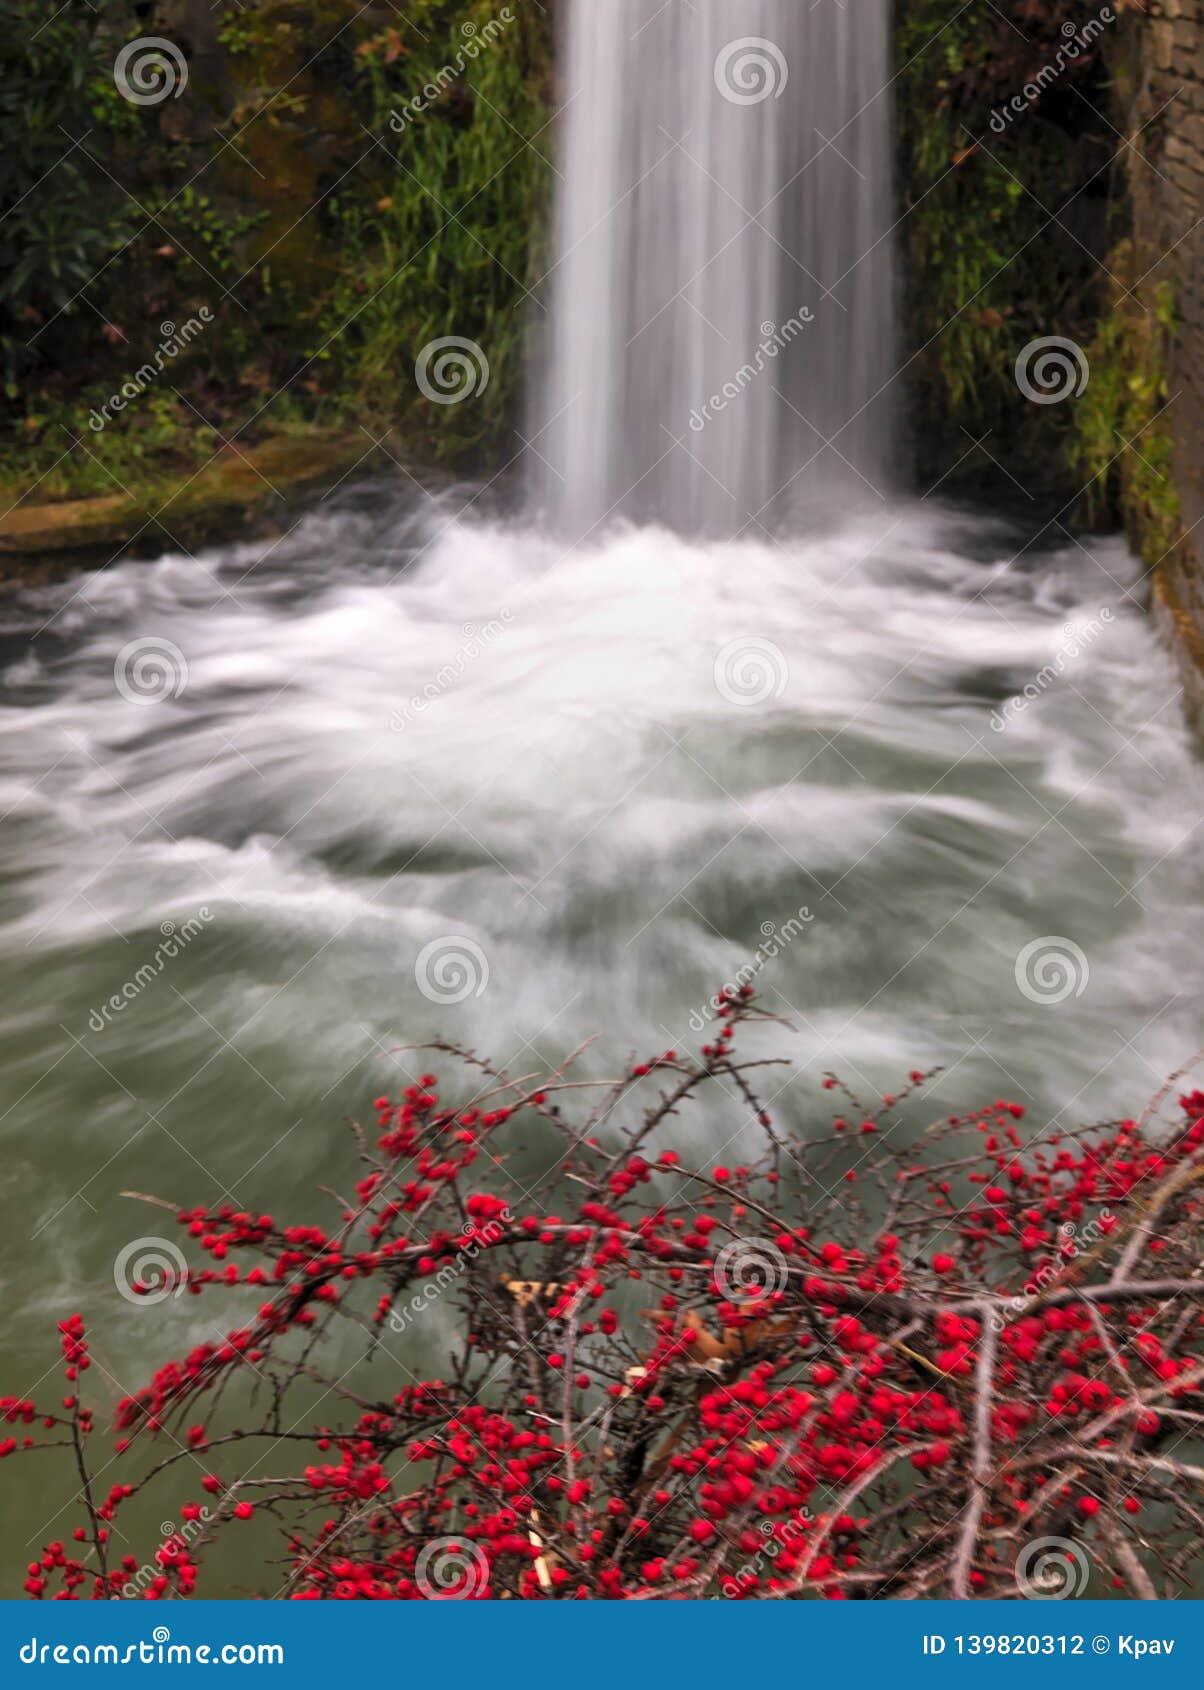 Waterval en installatie met rode kleine vruchten